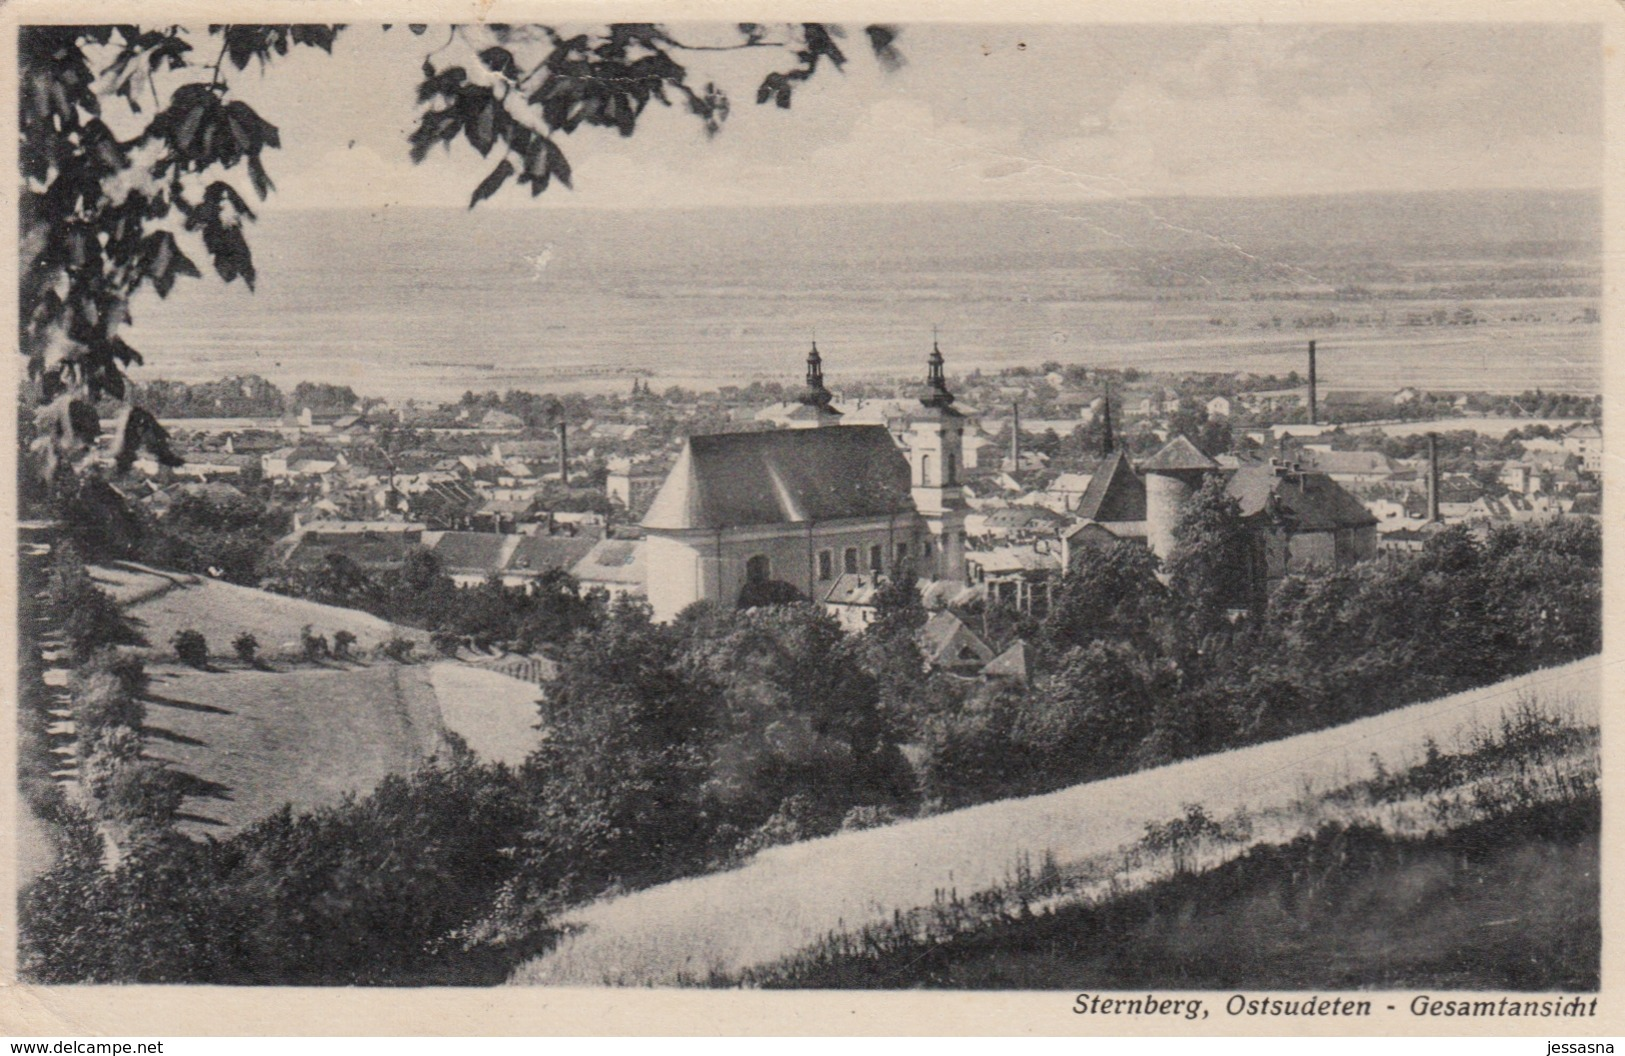 AK - Tschechien - Ostsudeten - Sternberg - 1944 - Tschechische Republik